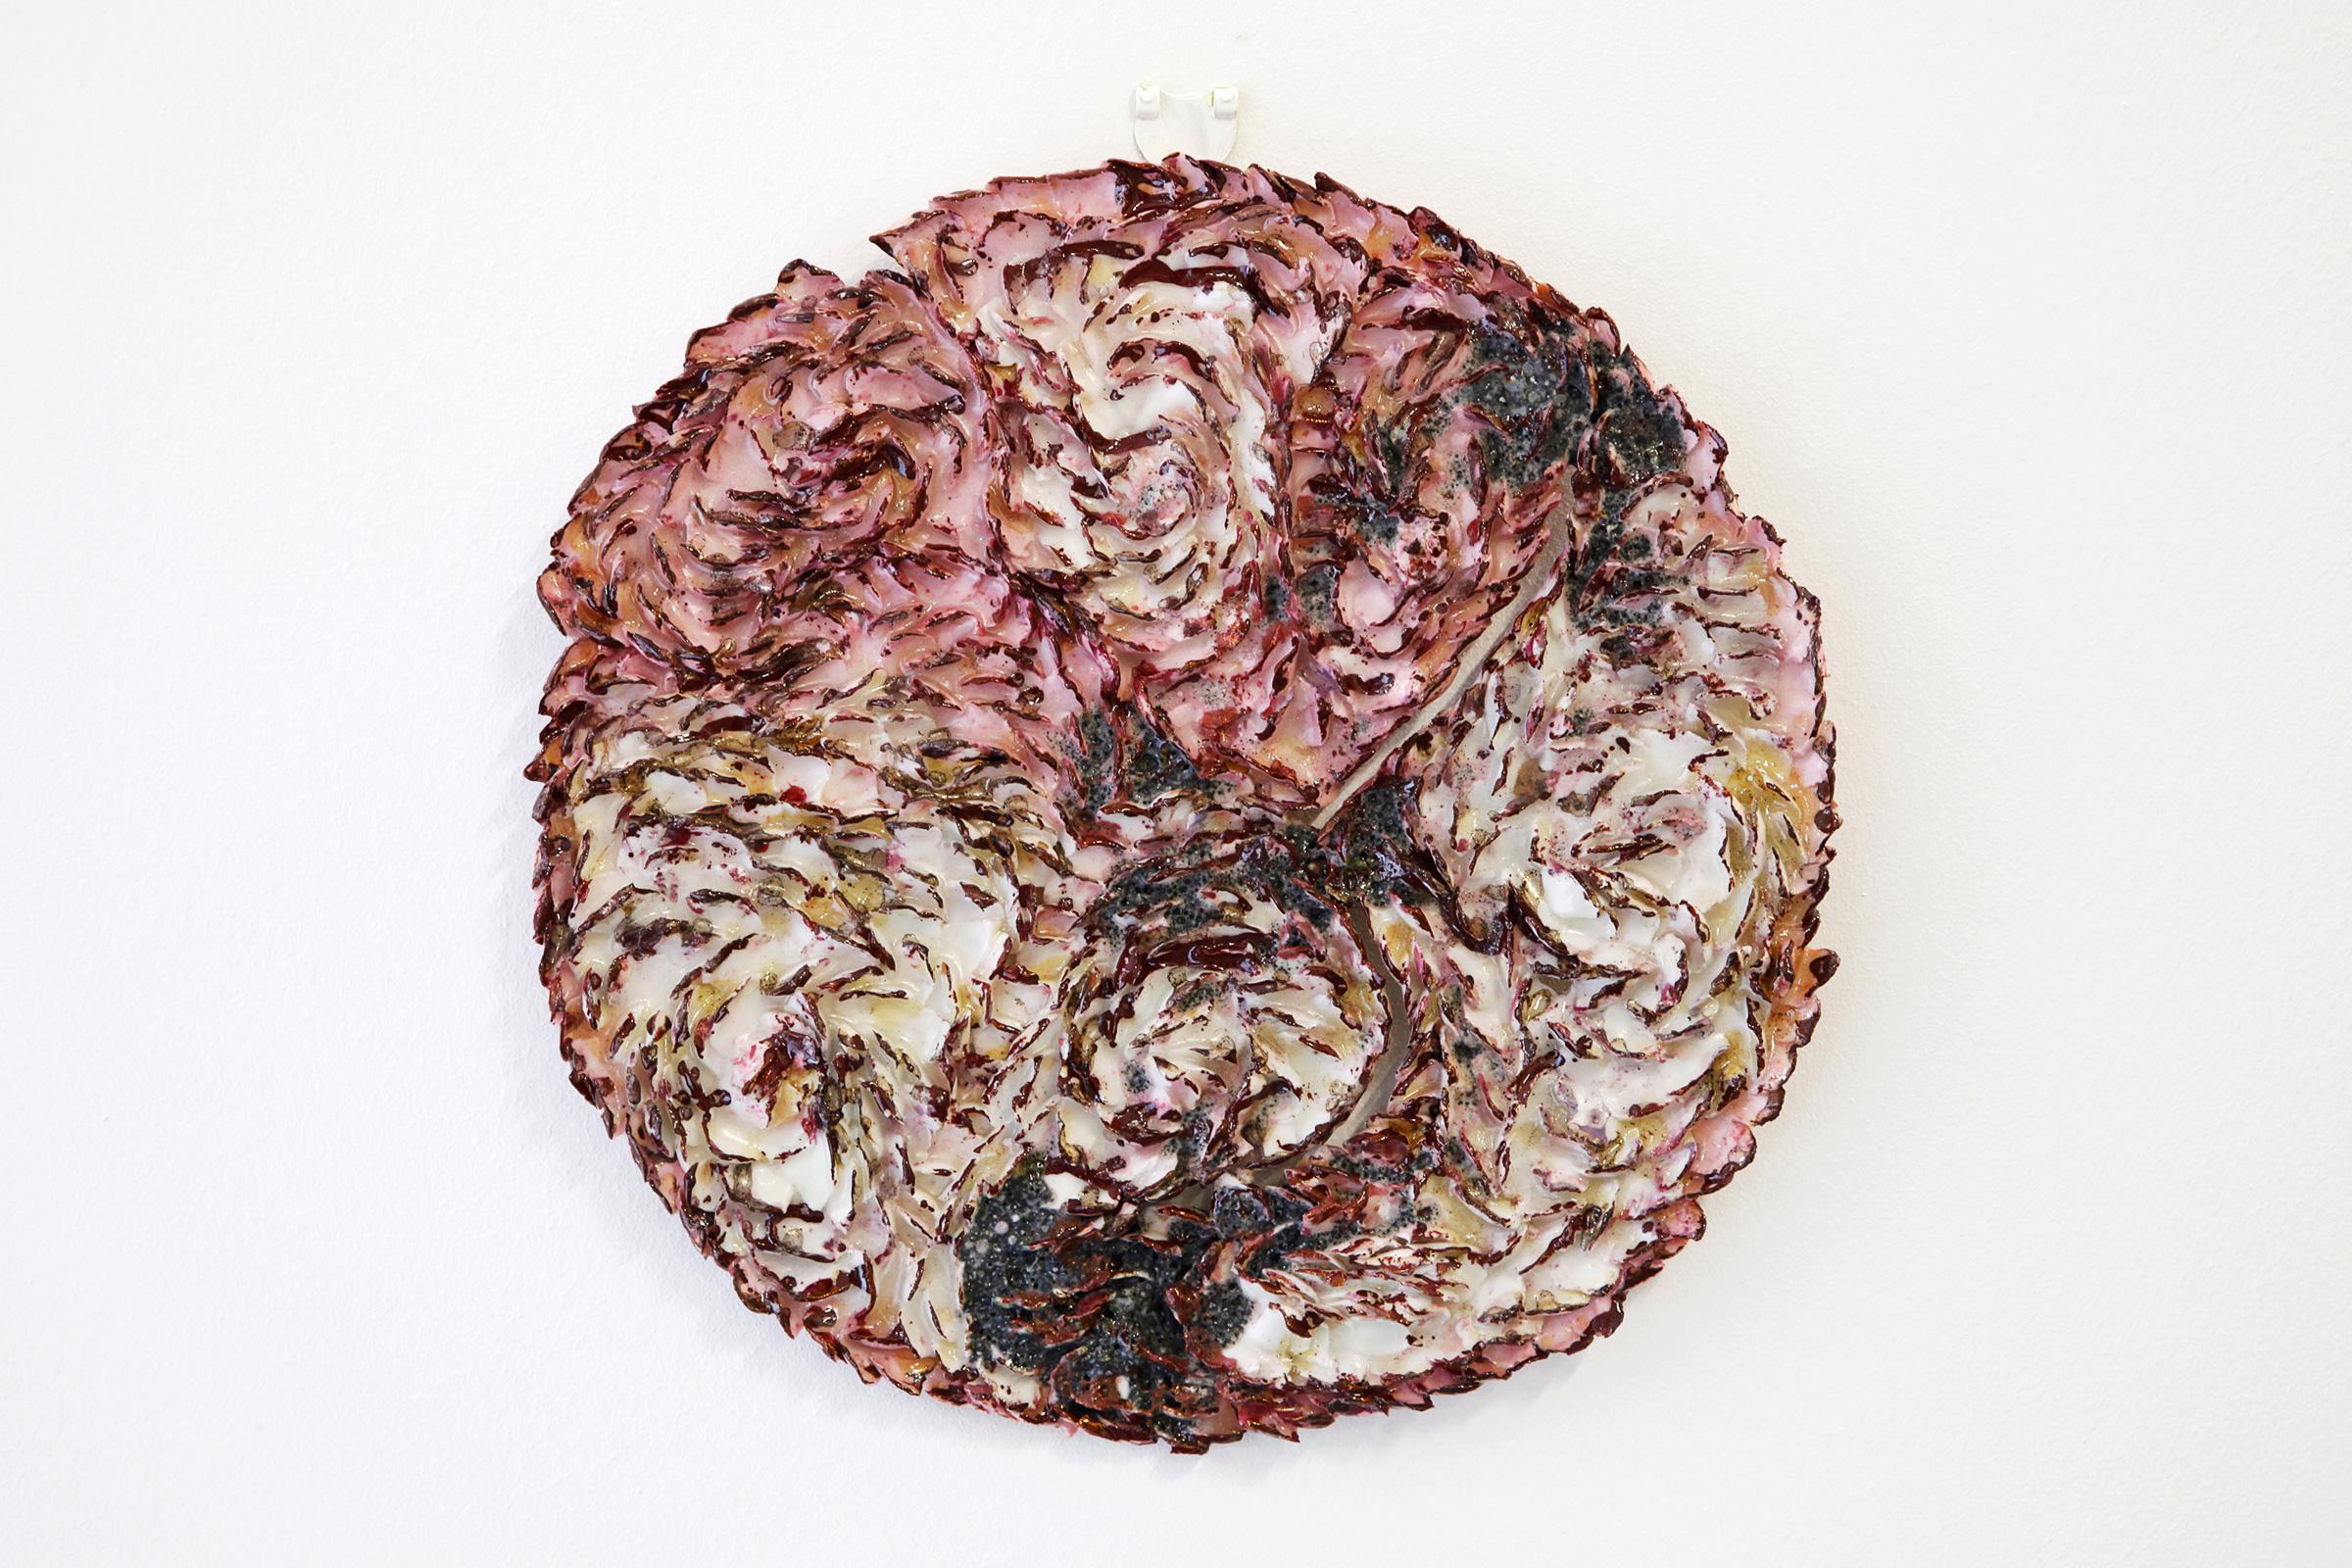 Wen-Hsi Harman, Land, porcelain, enamel, lustre, 32 x 31 x 2 cm, 2015